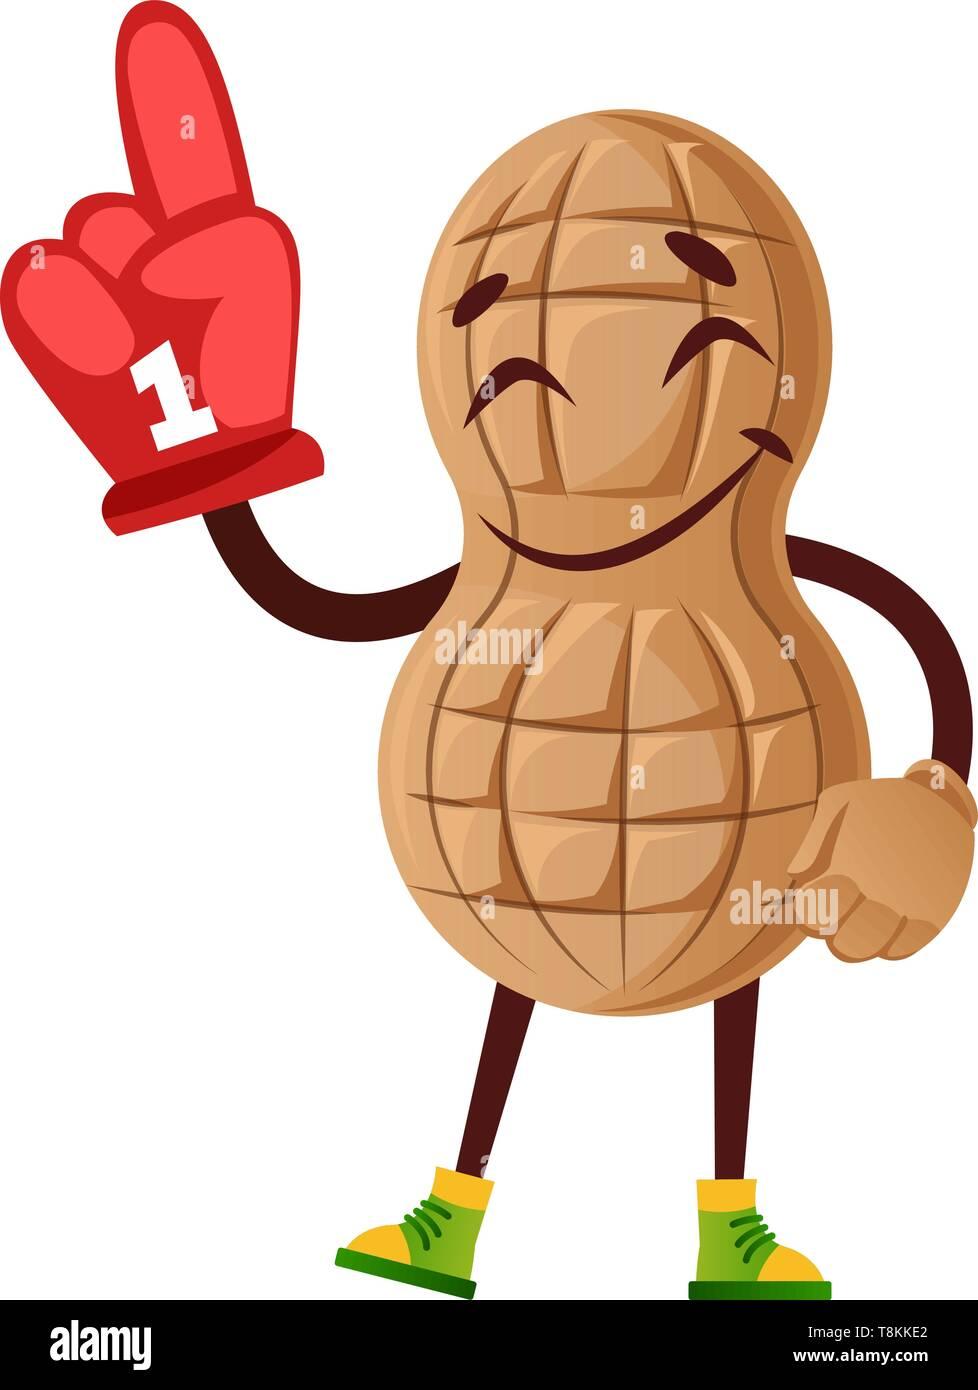 Boxing Gloves Icon Cartoon Style Stock Photos & Boxing